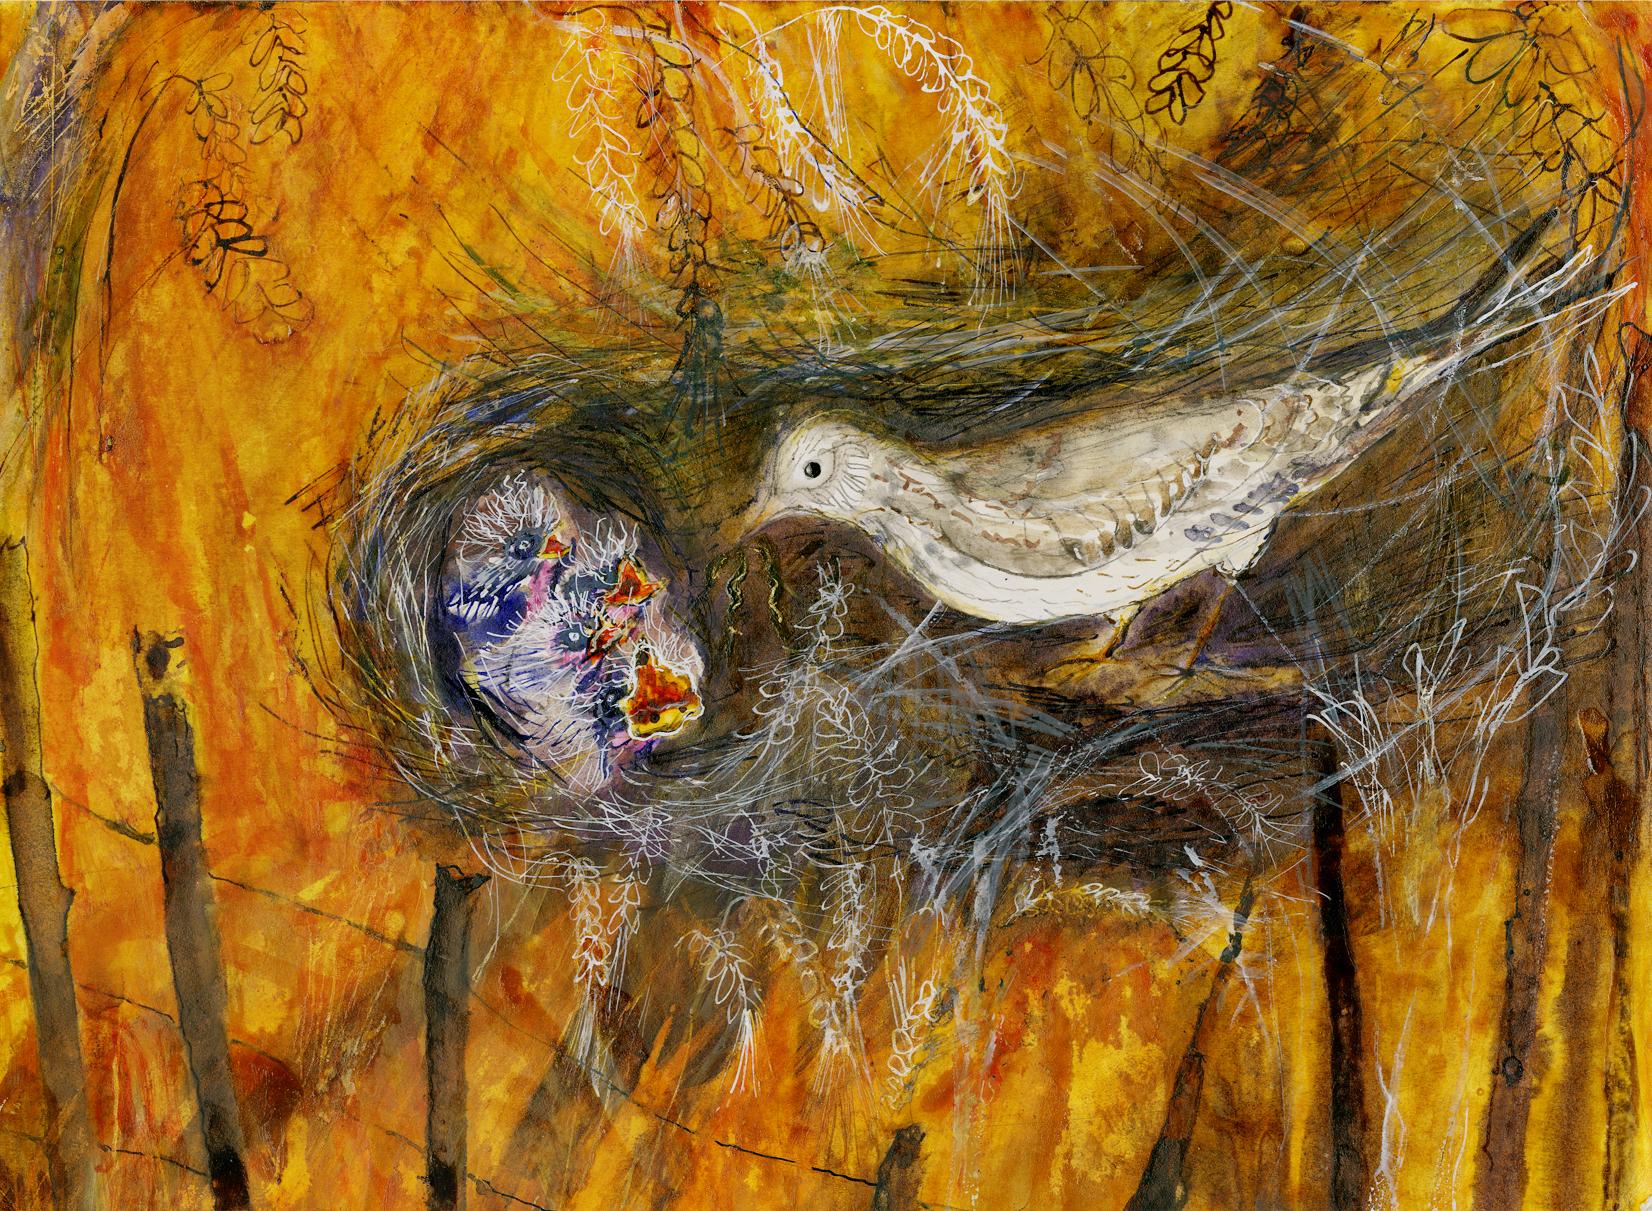 Nesting lark in scraped hollow